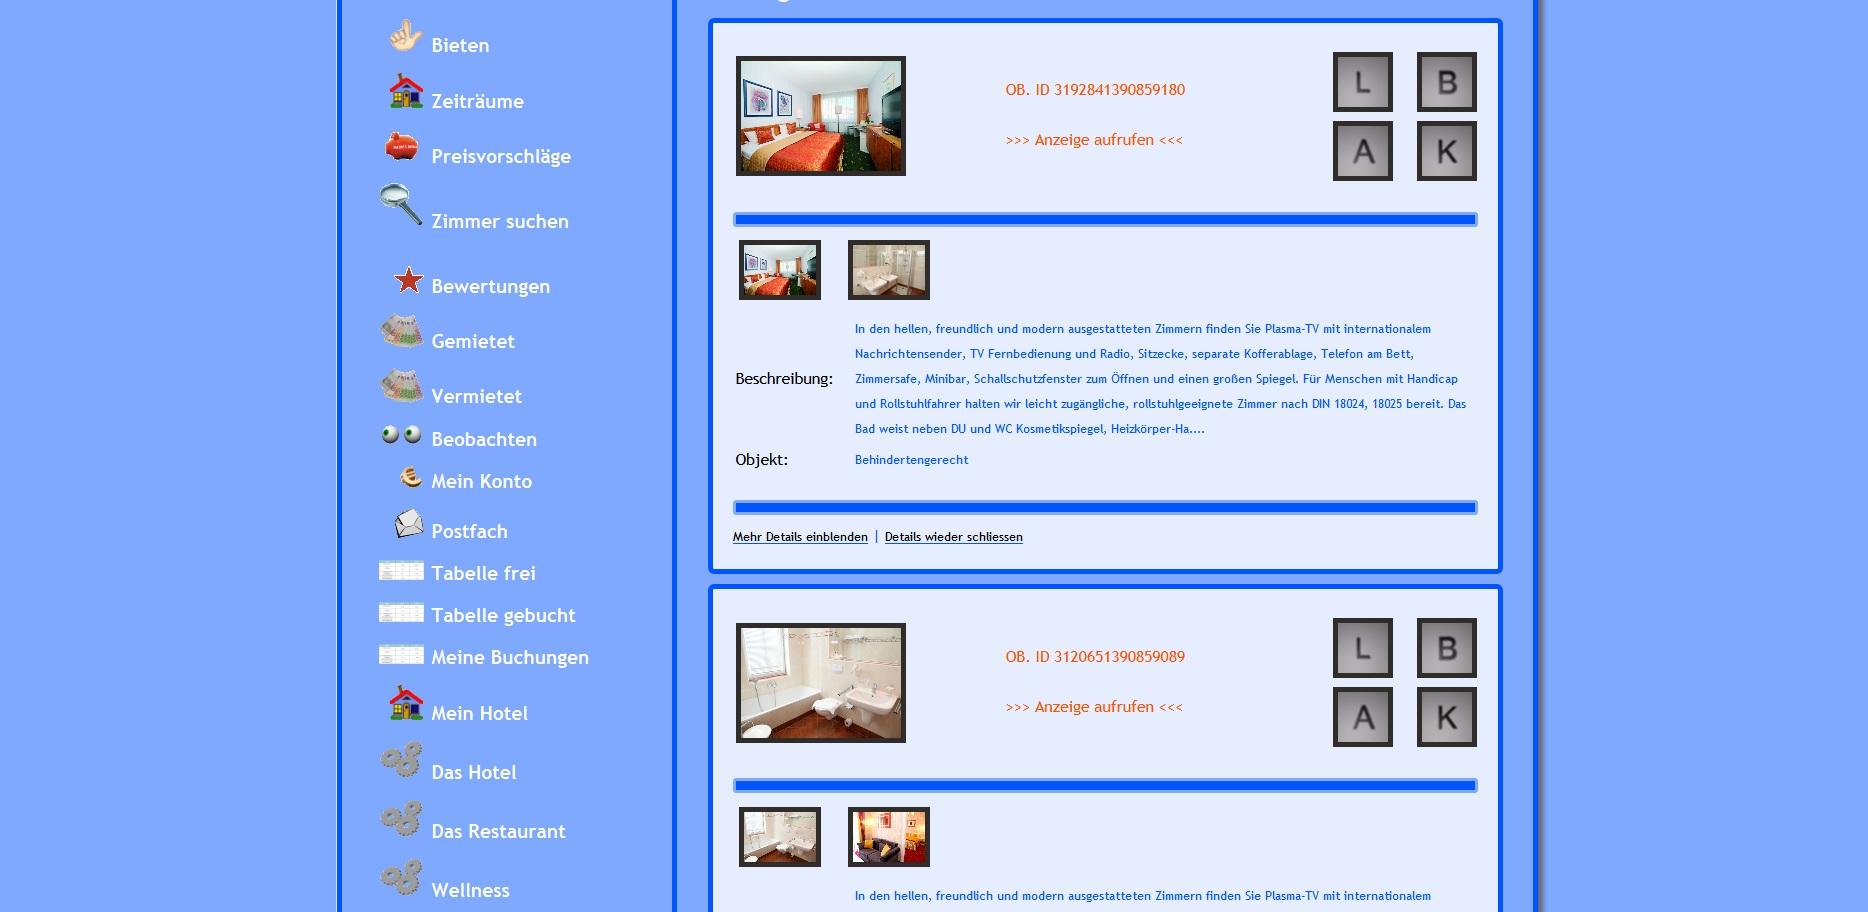 Hotelmanagementsoftware2